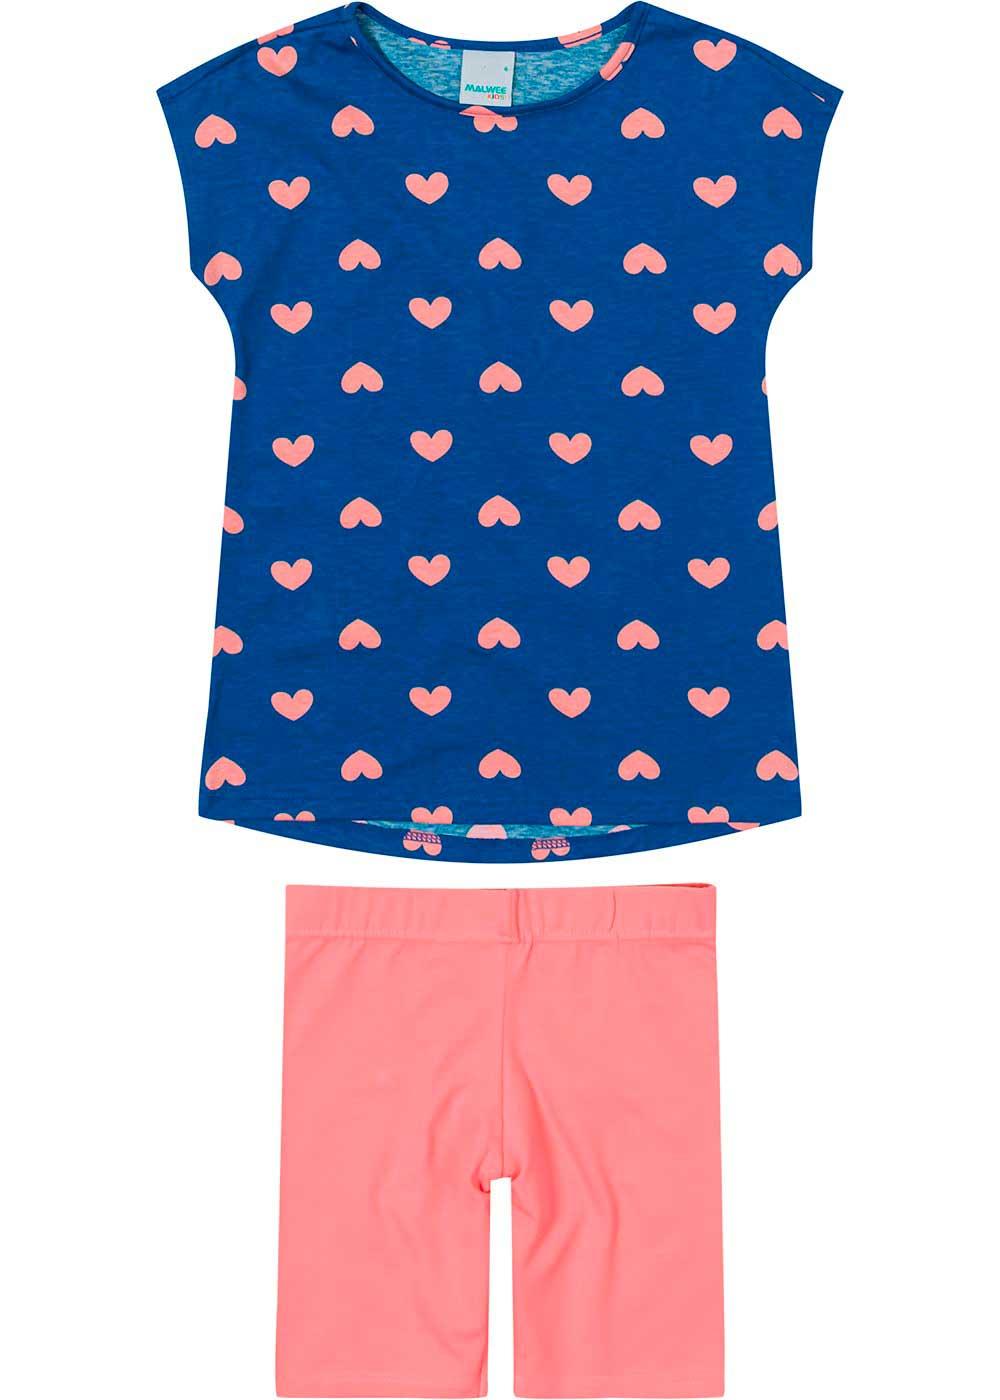 Conjunto Infantil Feminino Curto Azul Hearts - Malwee